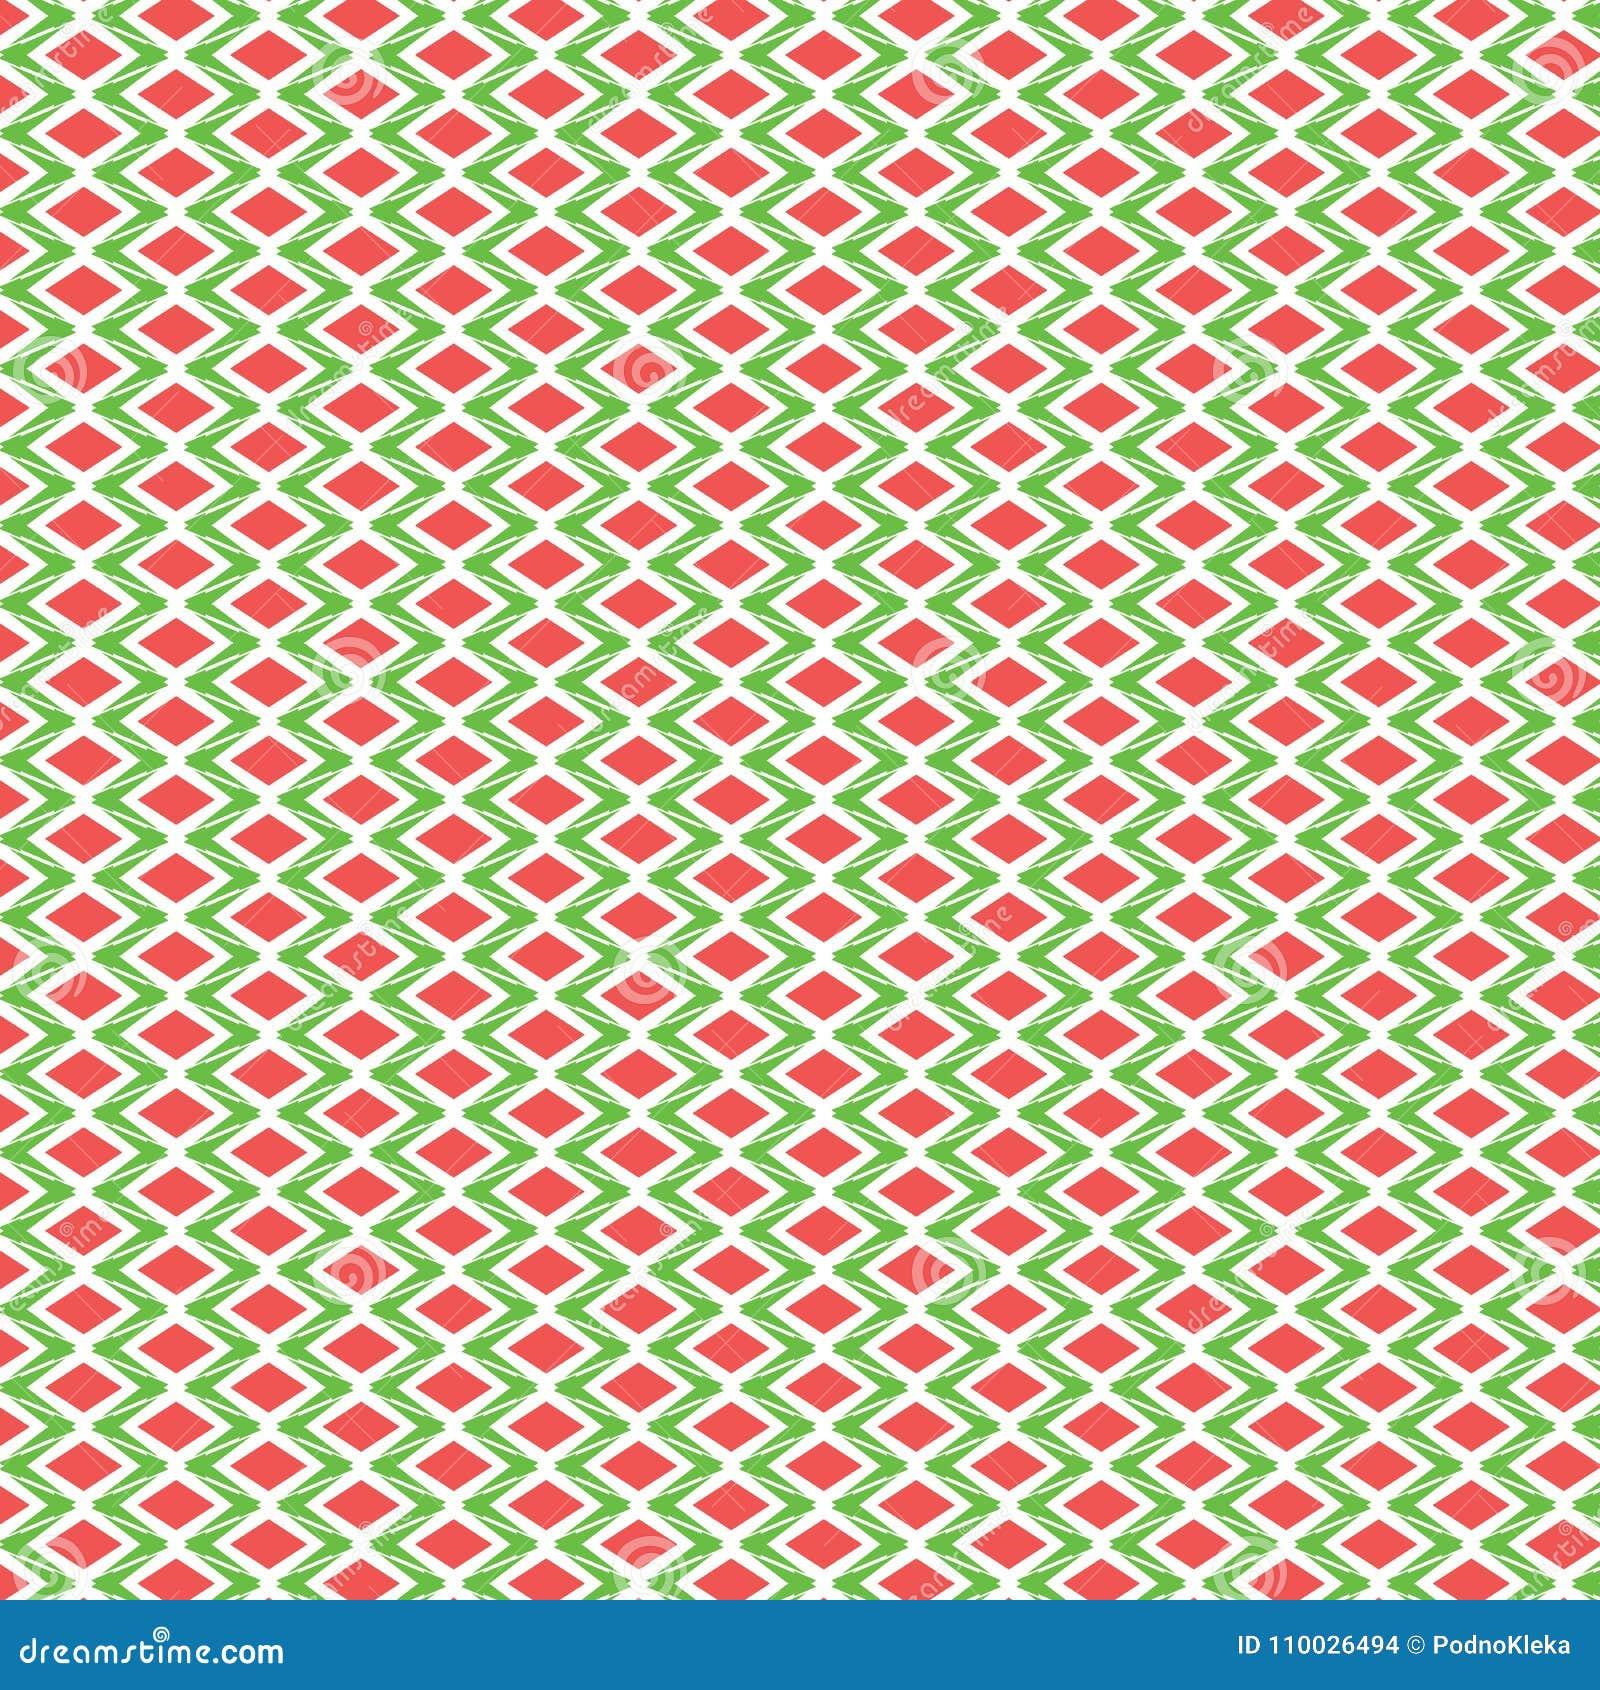 Argyle Unique Abstract Geometric Fabric-Patroon Achtergrondtextuur